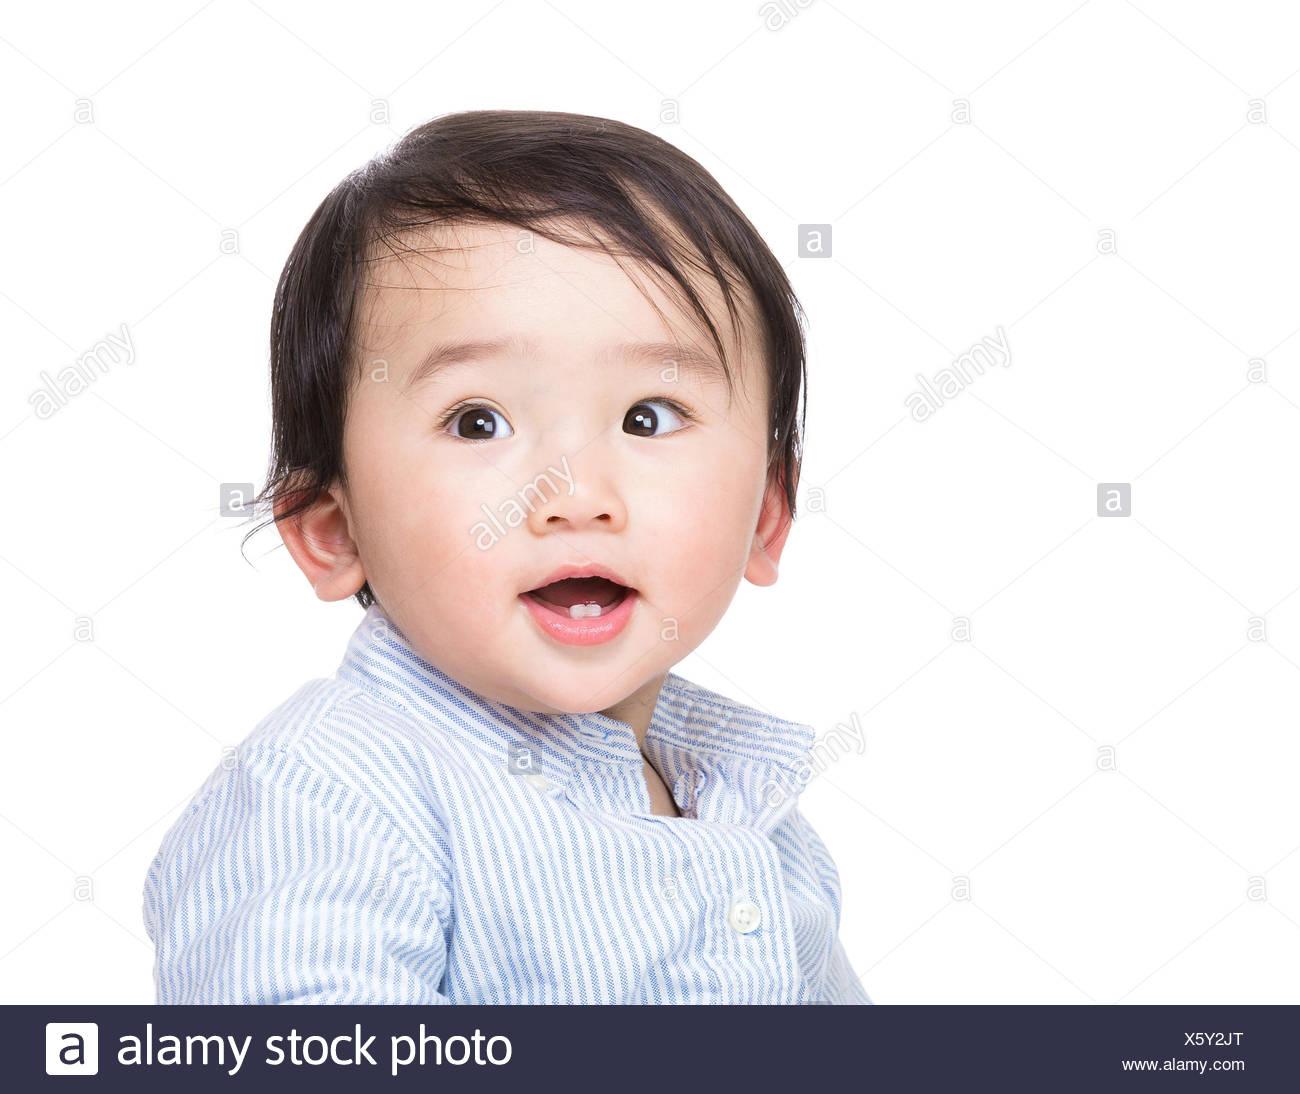 japanese cute child baby stock photos & japanese cute child baby